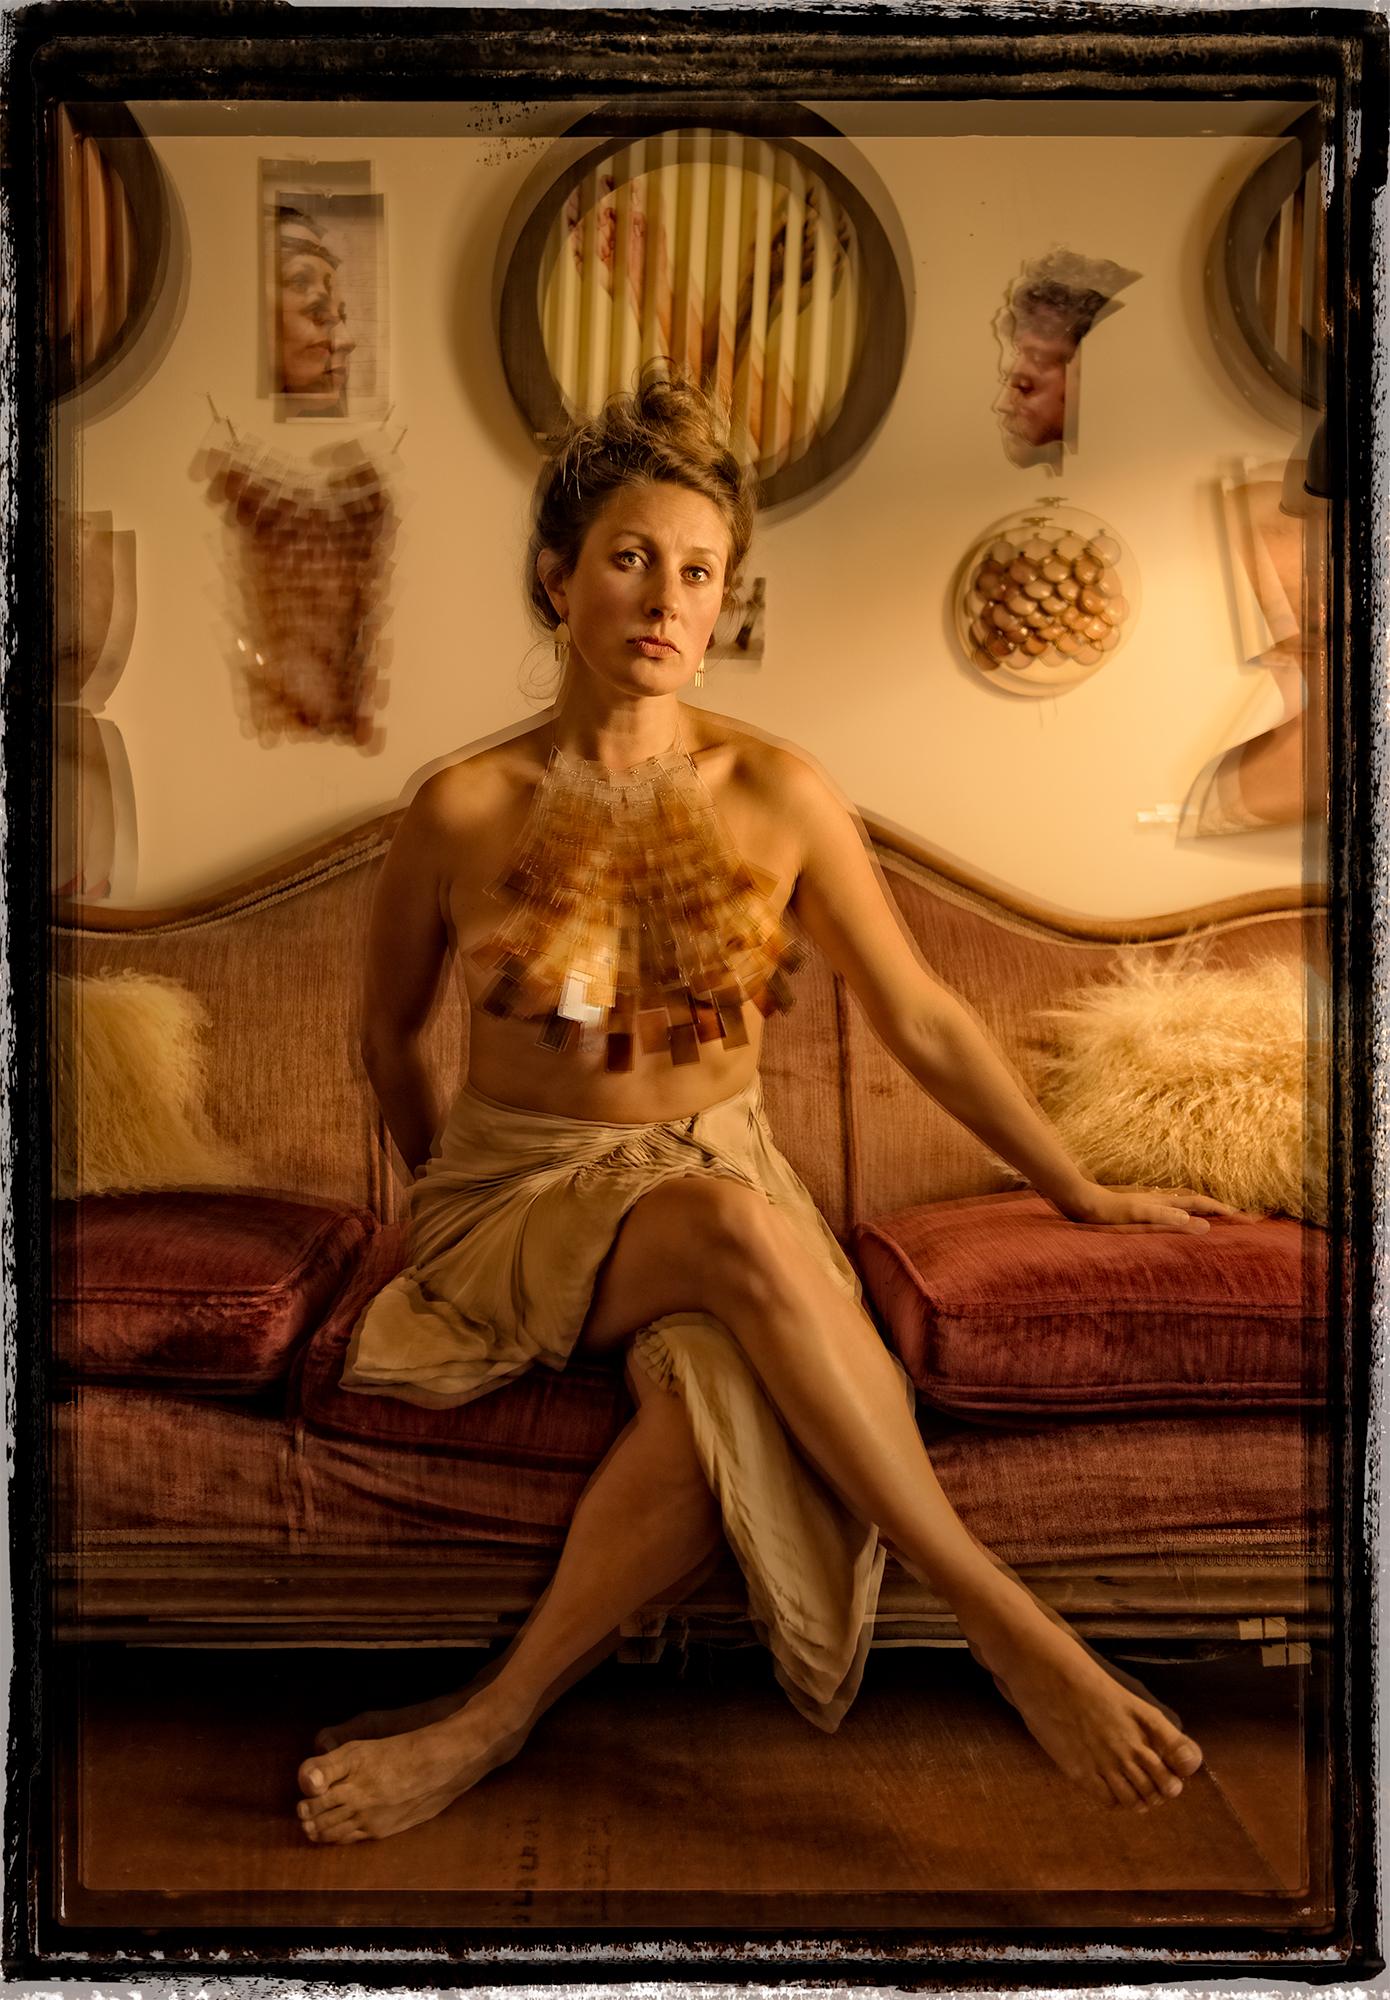 Charlotte Potter, glass artist. For Va Living Magazine.